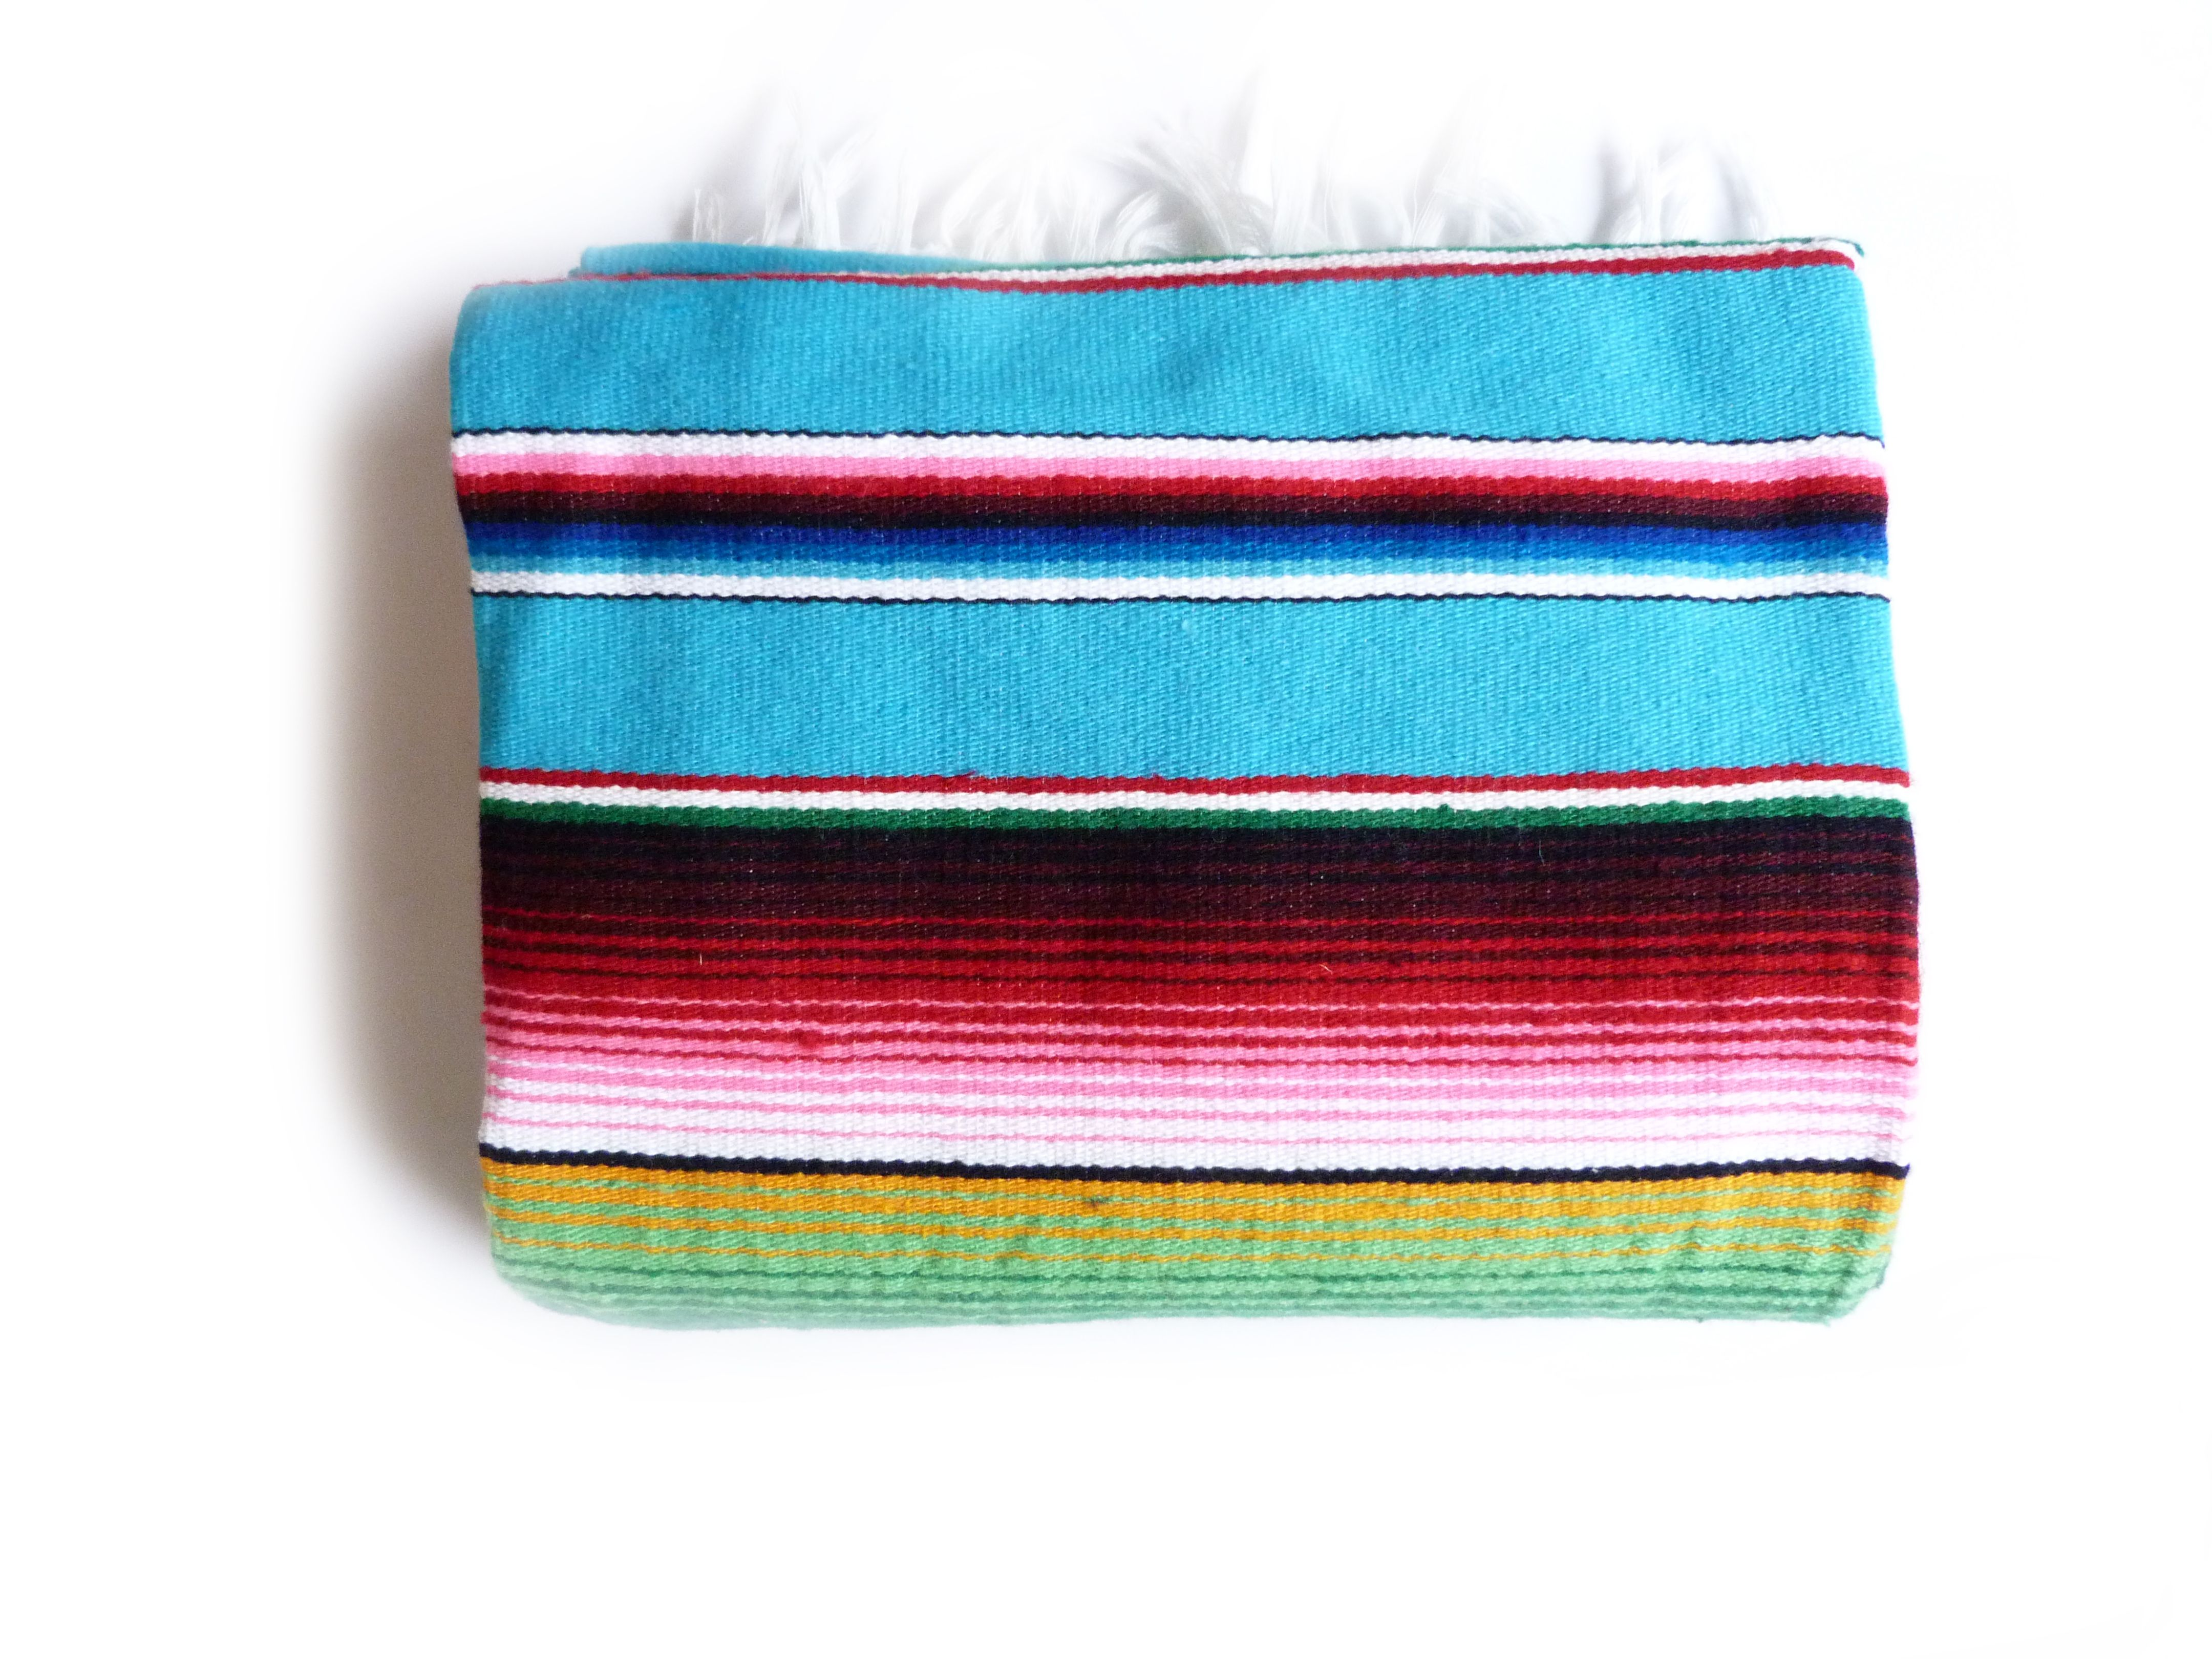 Saltillo Blau Mexiko Decke Mexican Blanket Picknick Deko Mexico